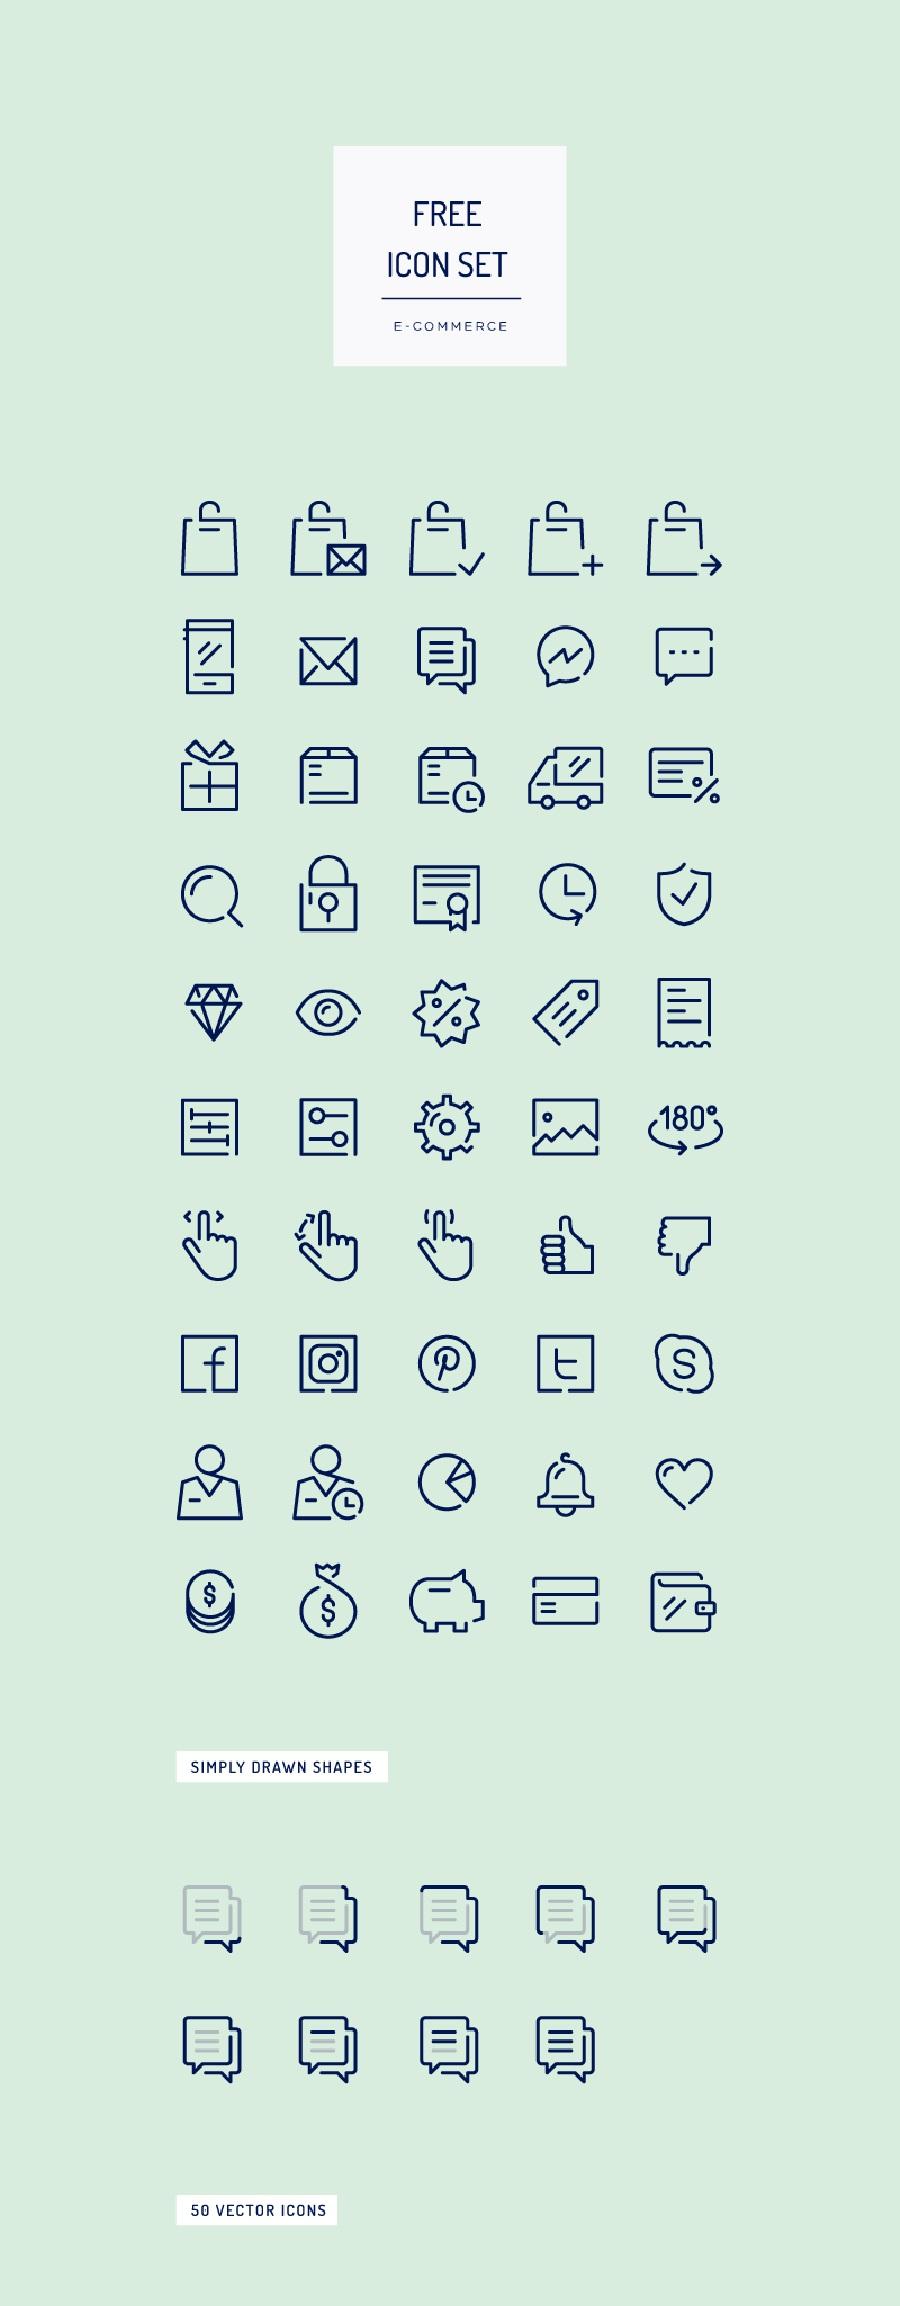 50 Free E-Commerce Icon Set